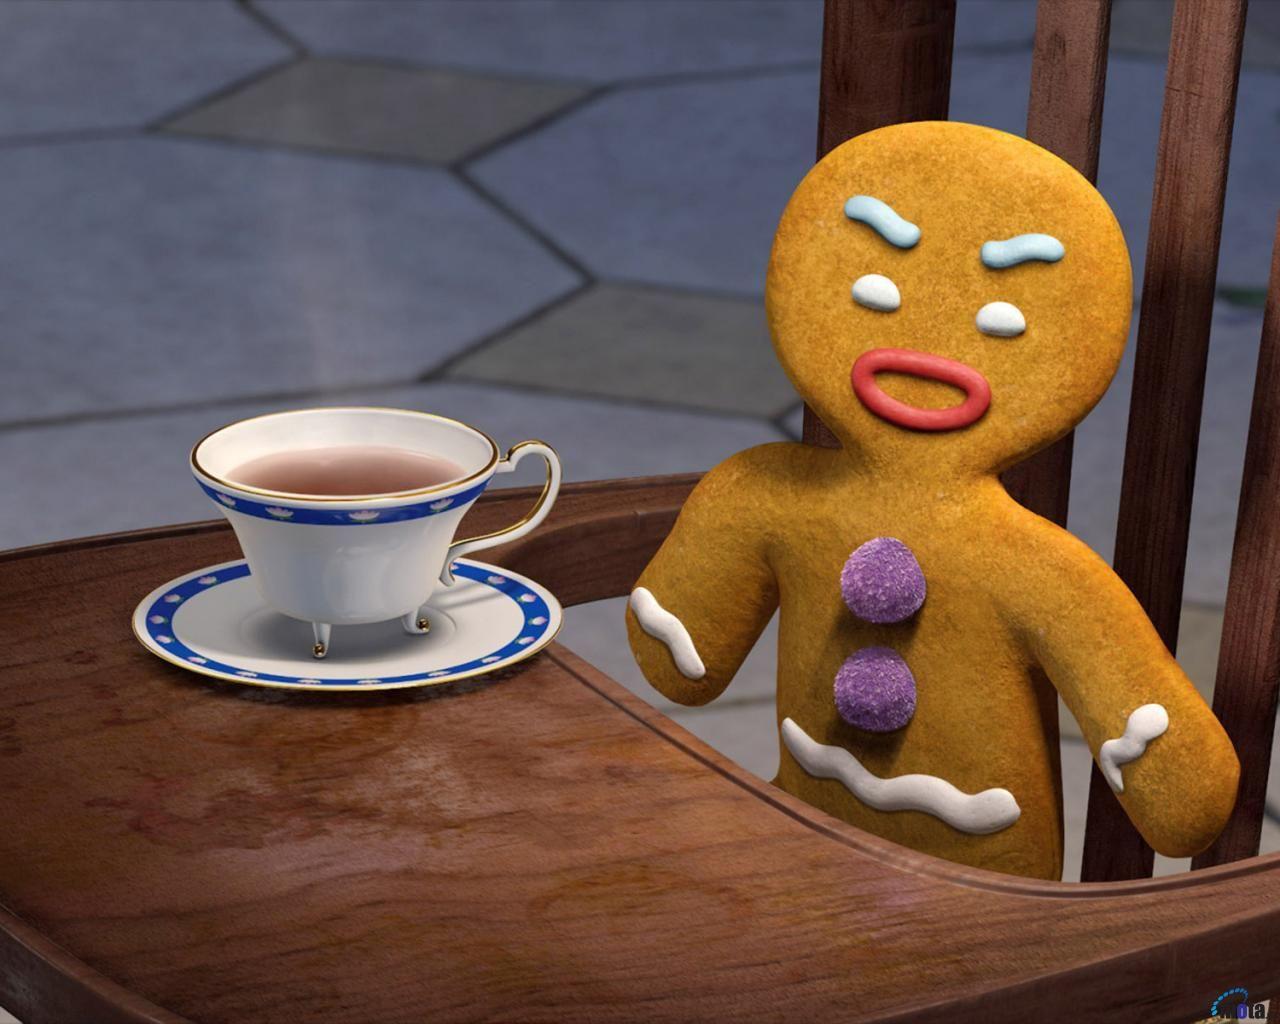 Pin By Baraka Chege On Throwback Pinterest Shrek Gingerbread